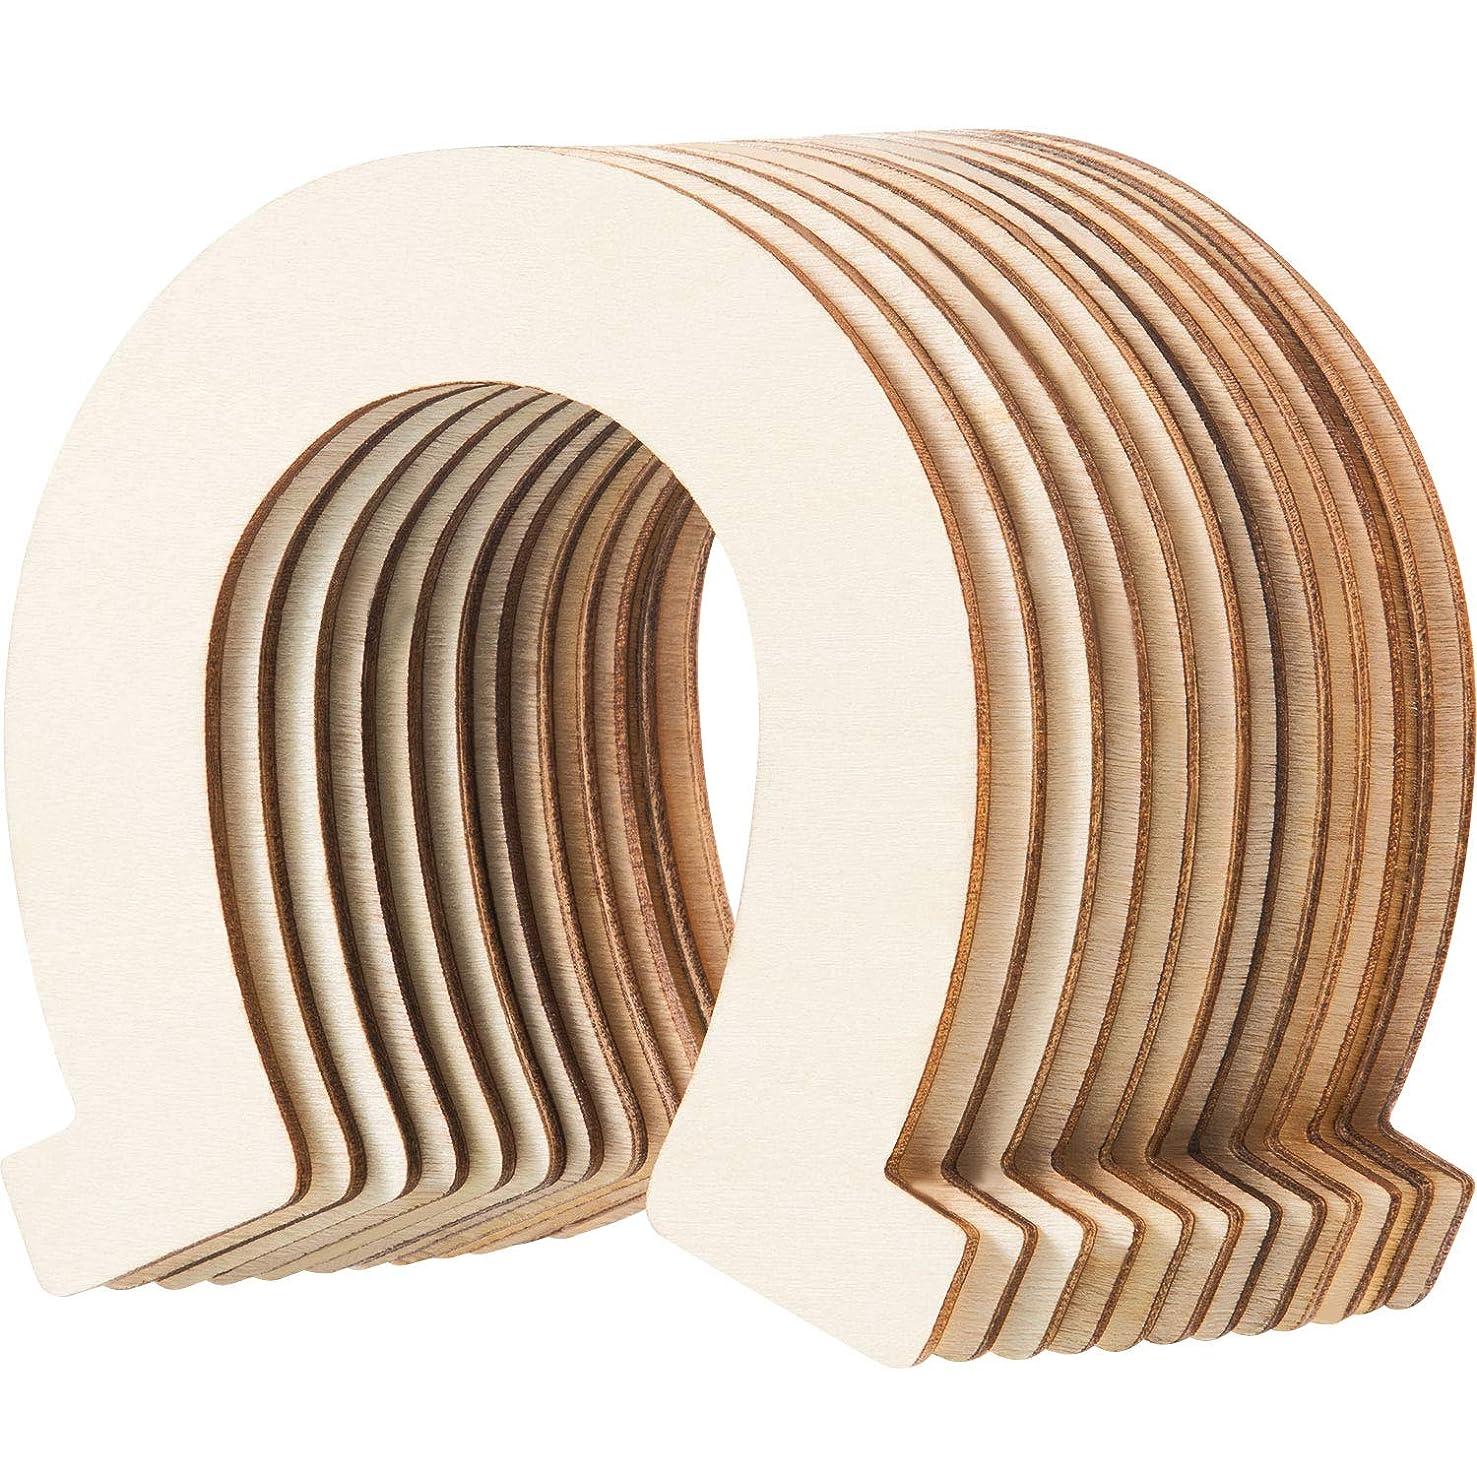 Wood Horseshoe Cutouts Unfinished Wooden Horseshoe Discs Slices Decoration for DIY Craft, Wedding, Party and Birthday(96 Packs)